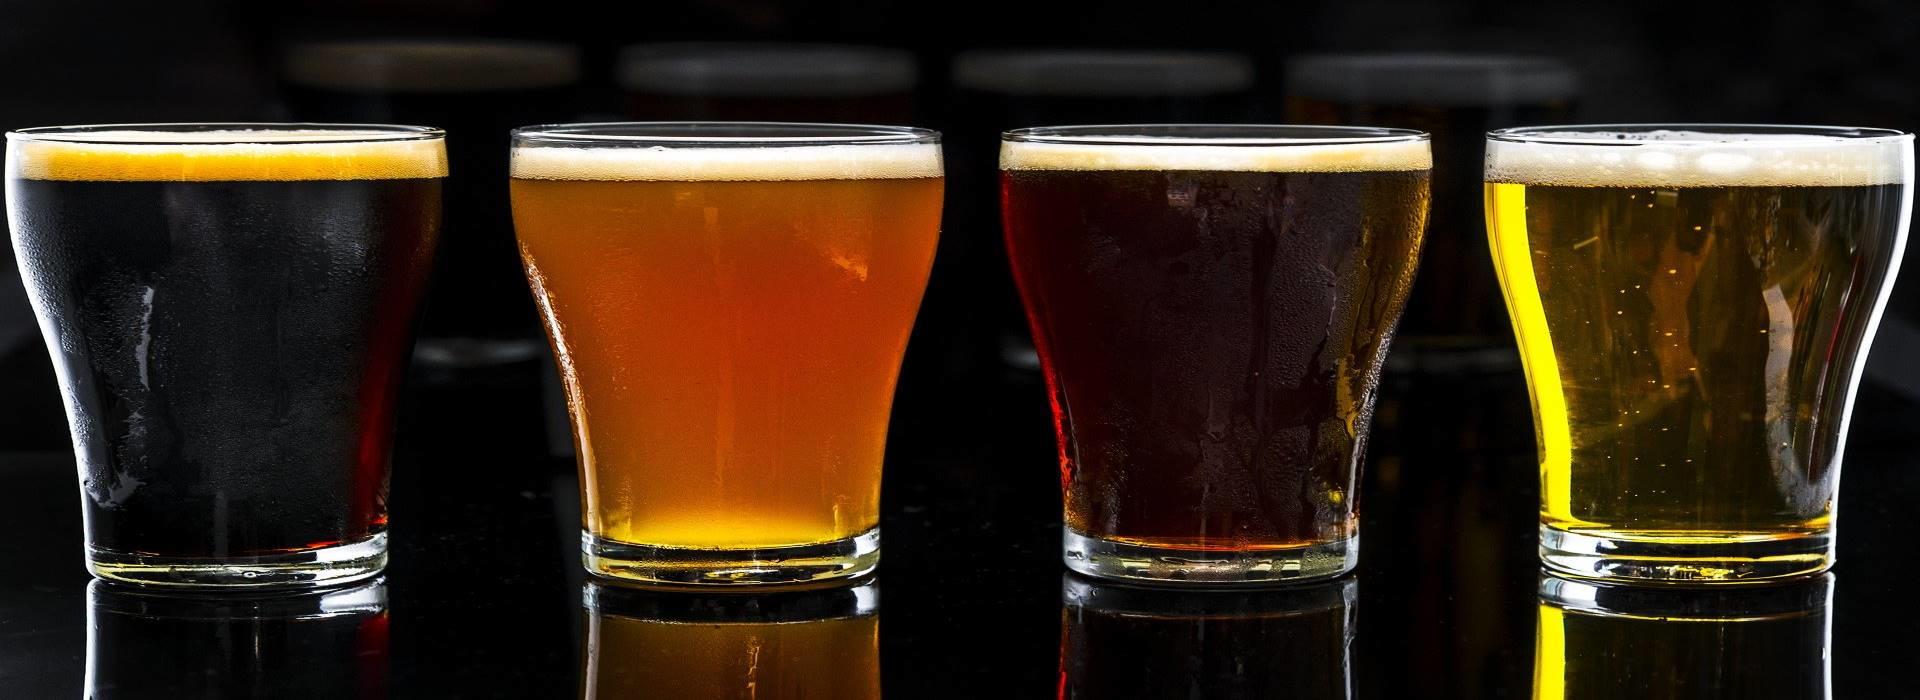 breweries-in-wilmington-nc